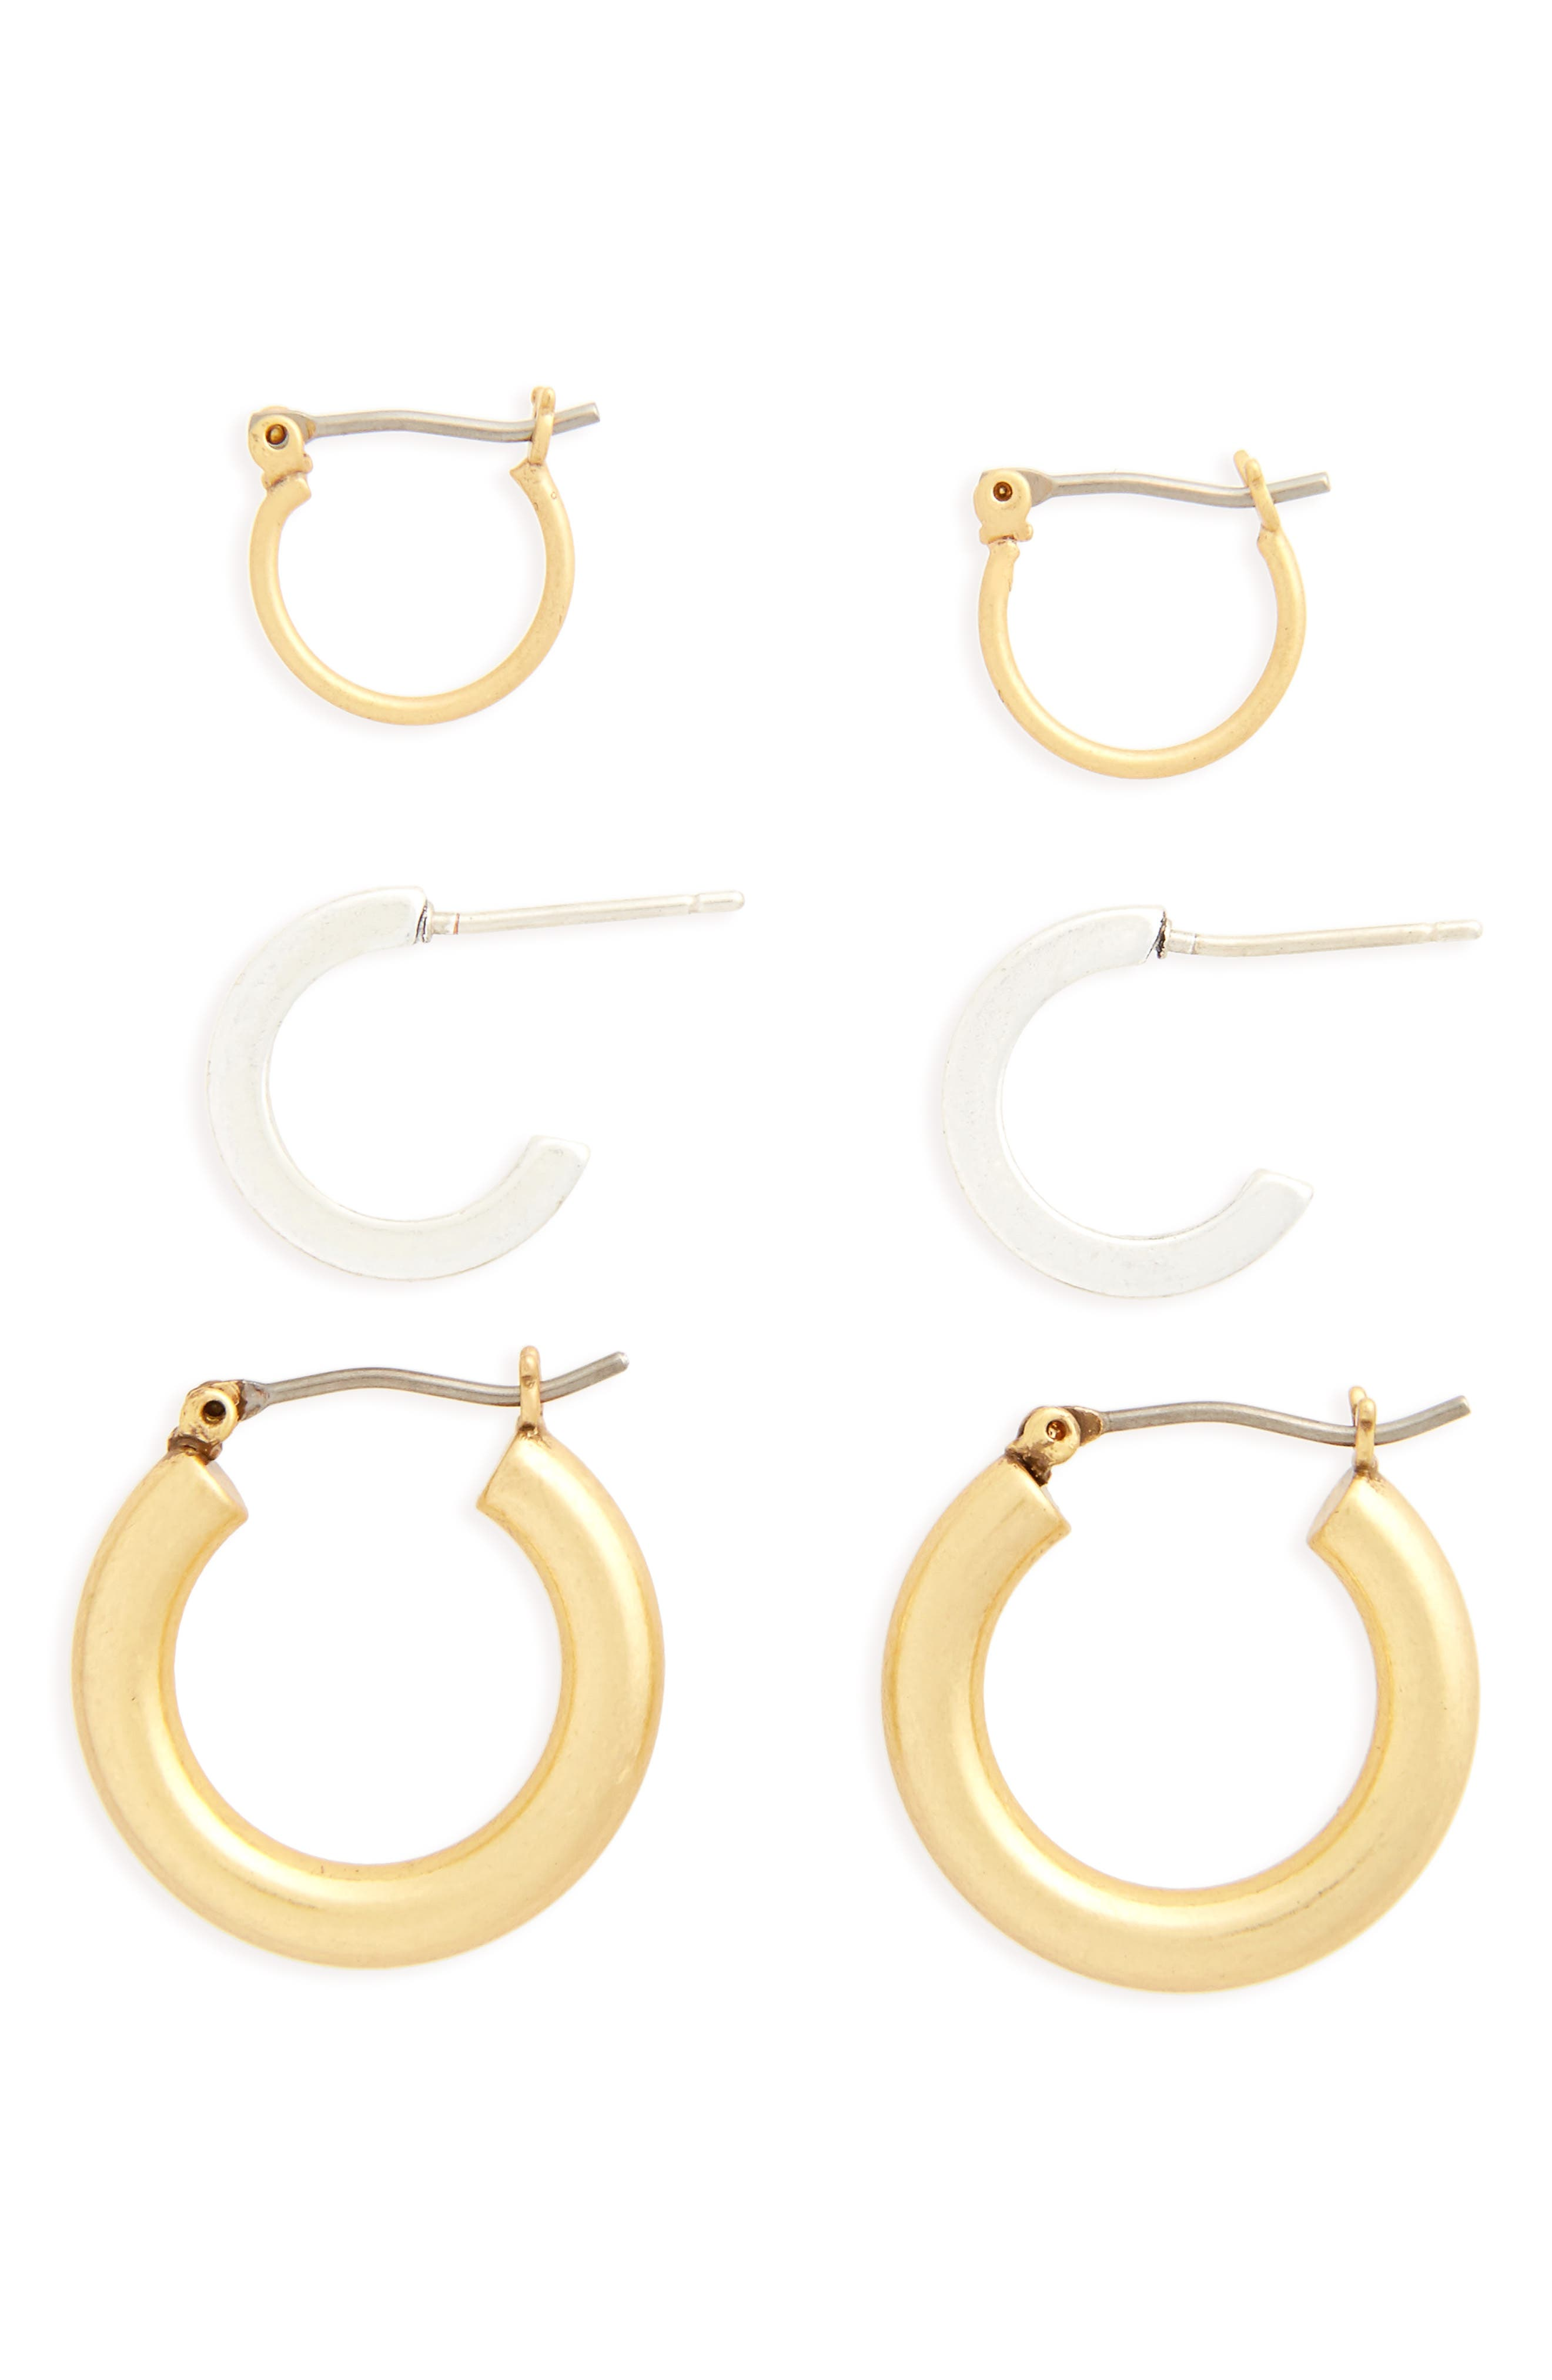 MADEWELL, Set of 3 Mini Hoop Earrings, Main thumbnail 1, color, MIXED METAL